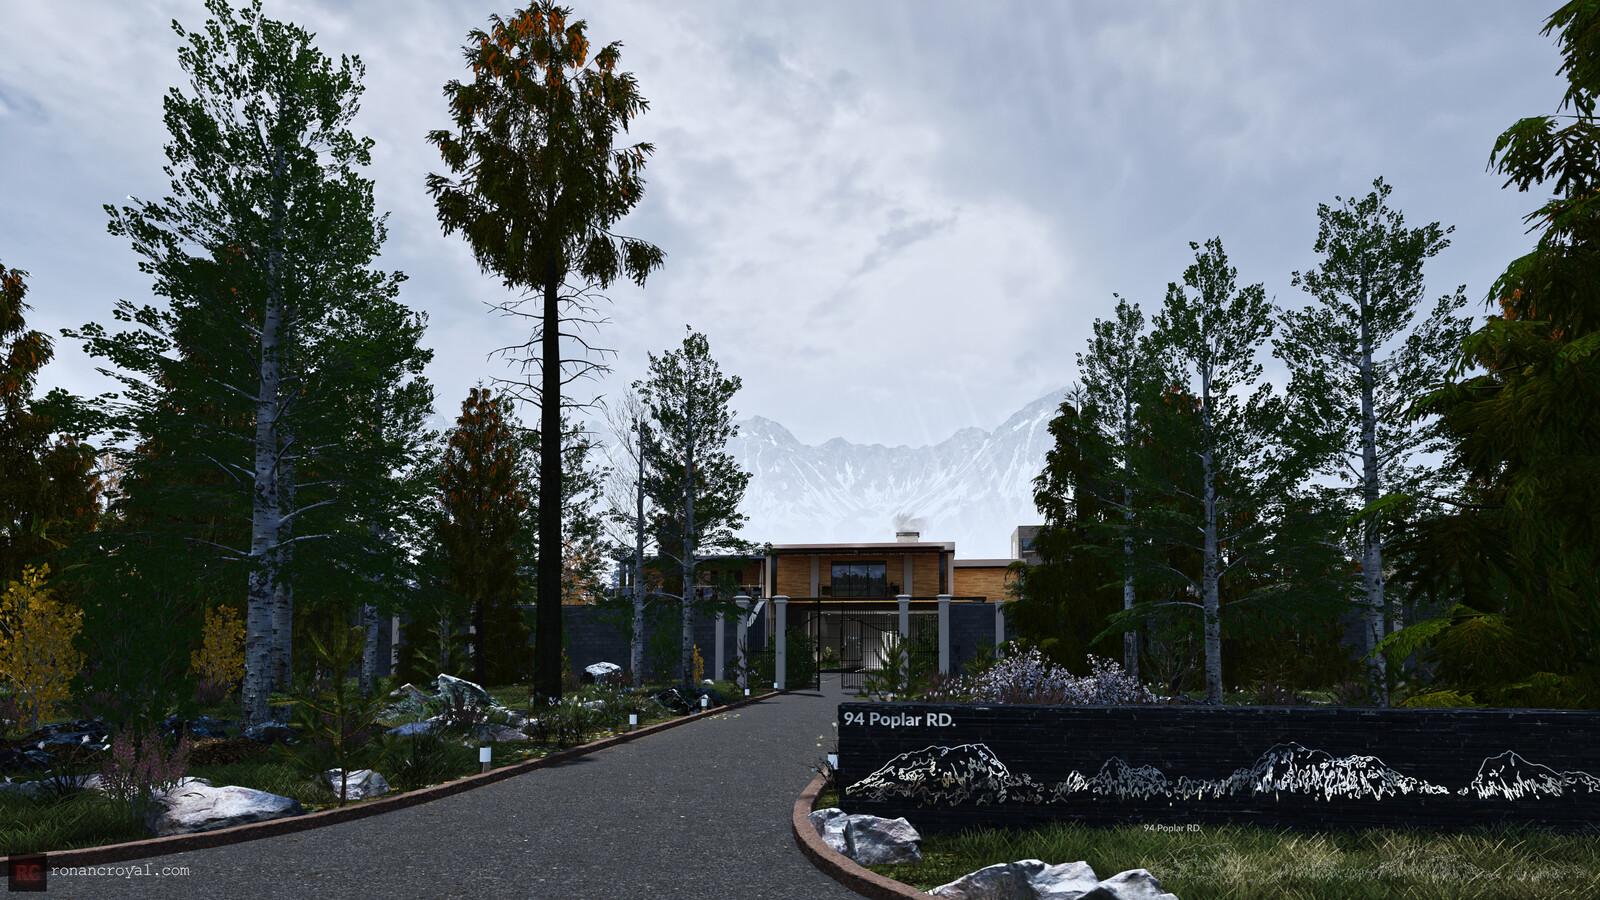 94 Poplar RD. - Unreal Engine 4 Interactive ArchViz Scene